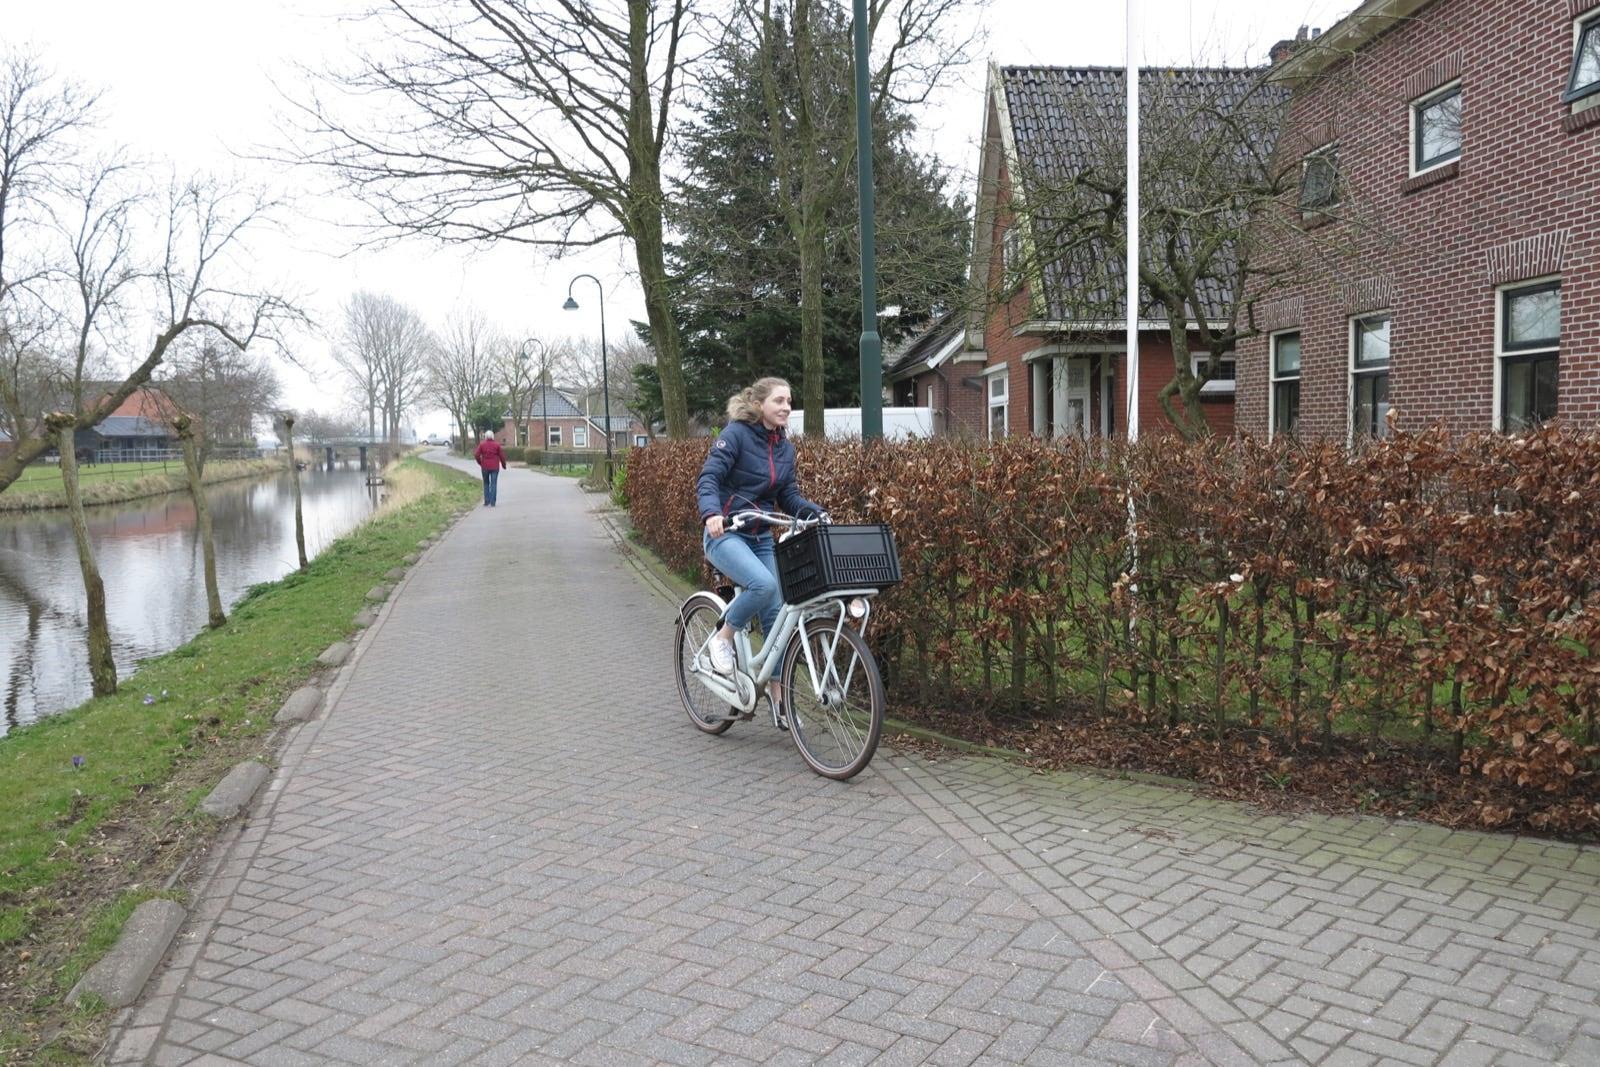 et-fiets-en-fietser-23-annemijn-uitham-oi.jpg